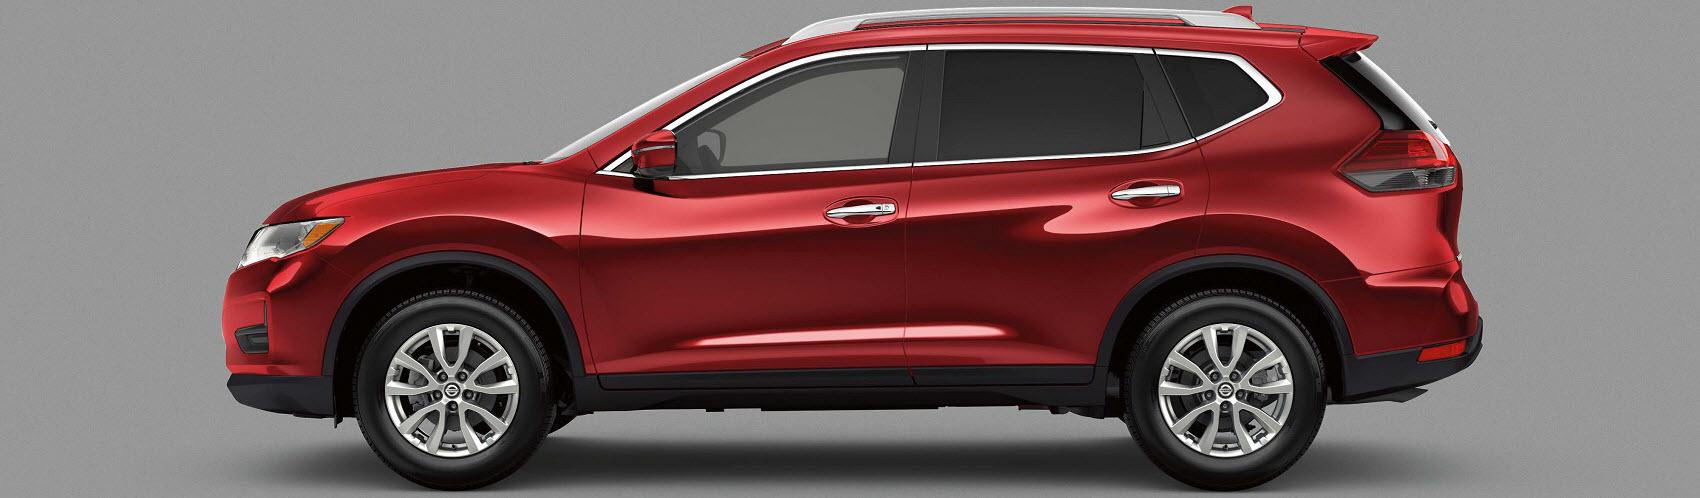 2020 Nissan Rogue Trim Levels